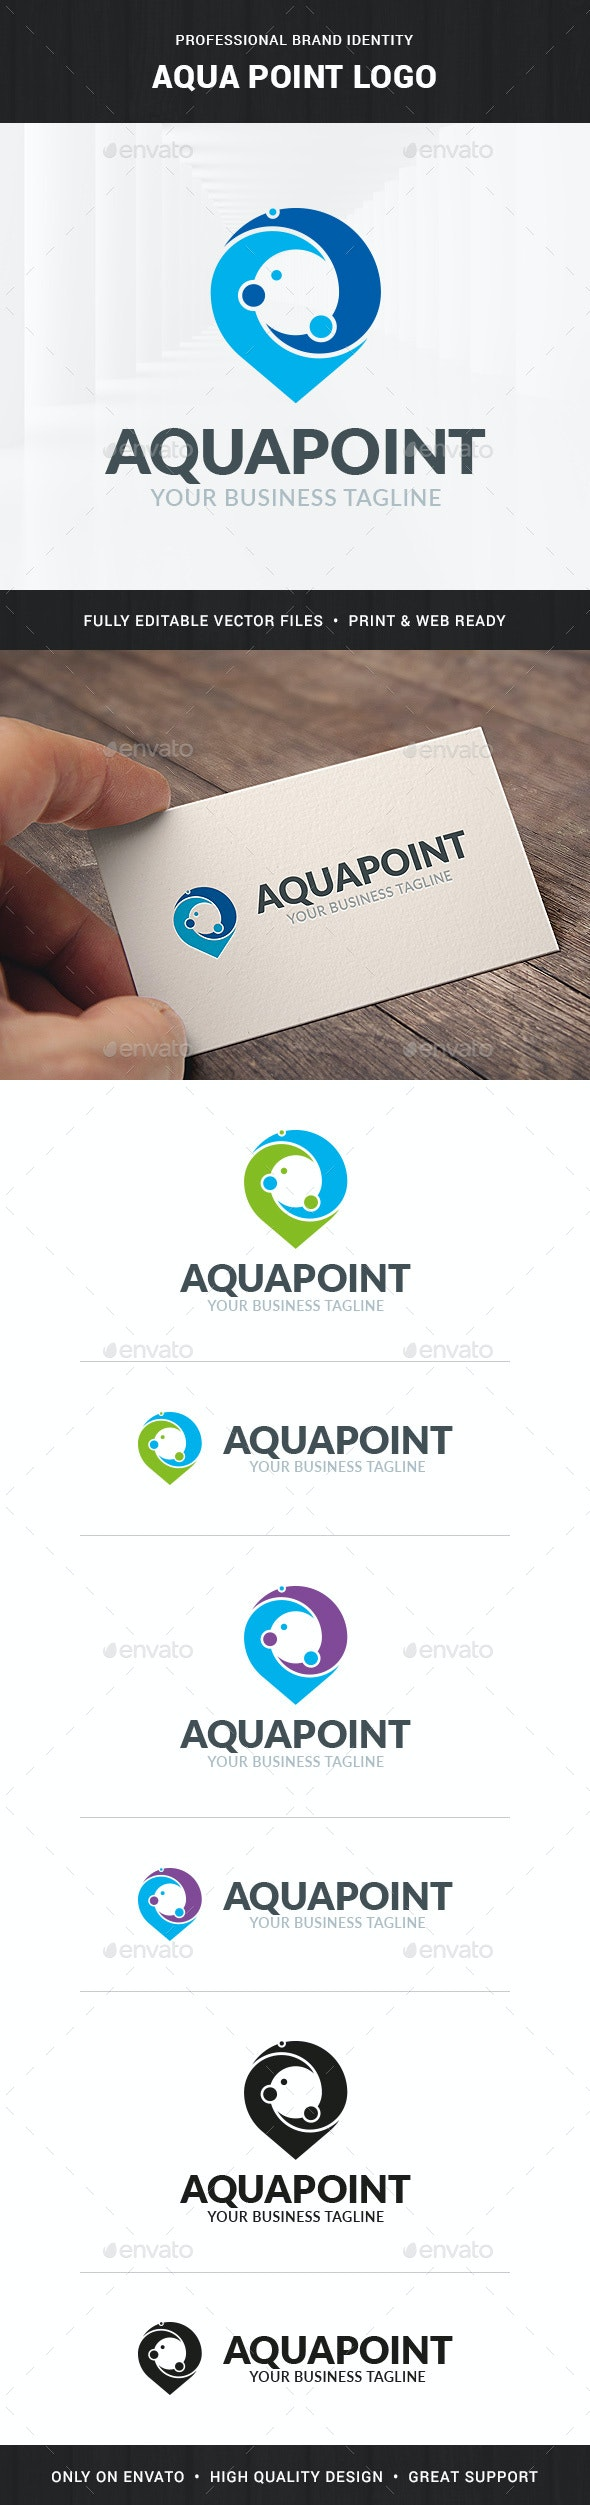 Aqua Point Logo Template - Abstract Logo Templates